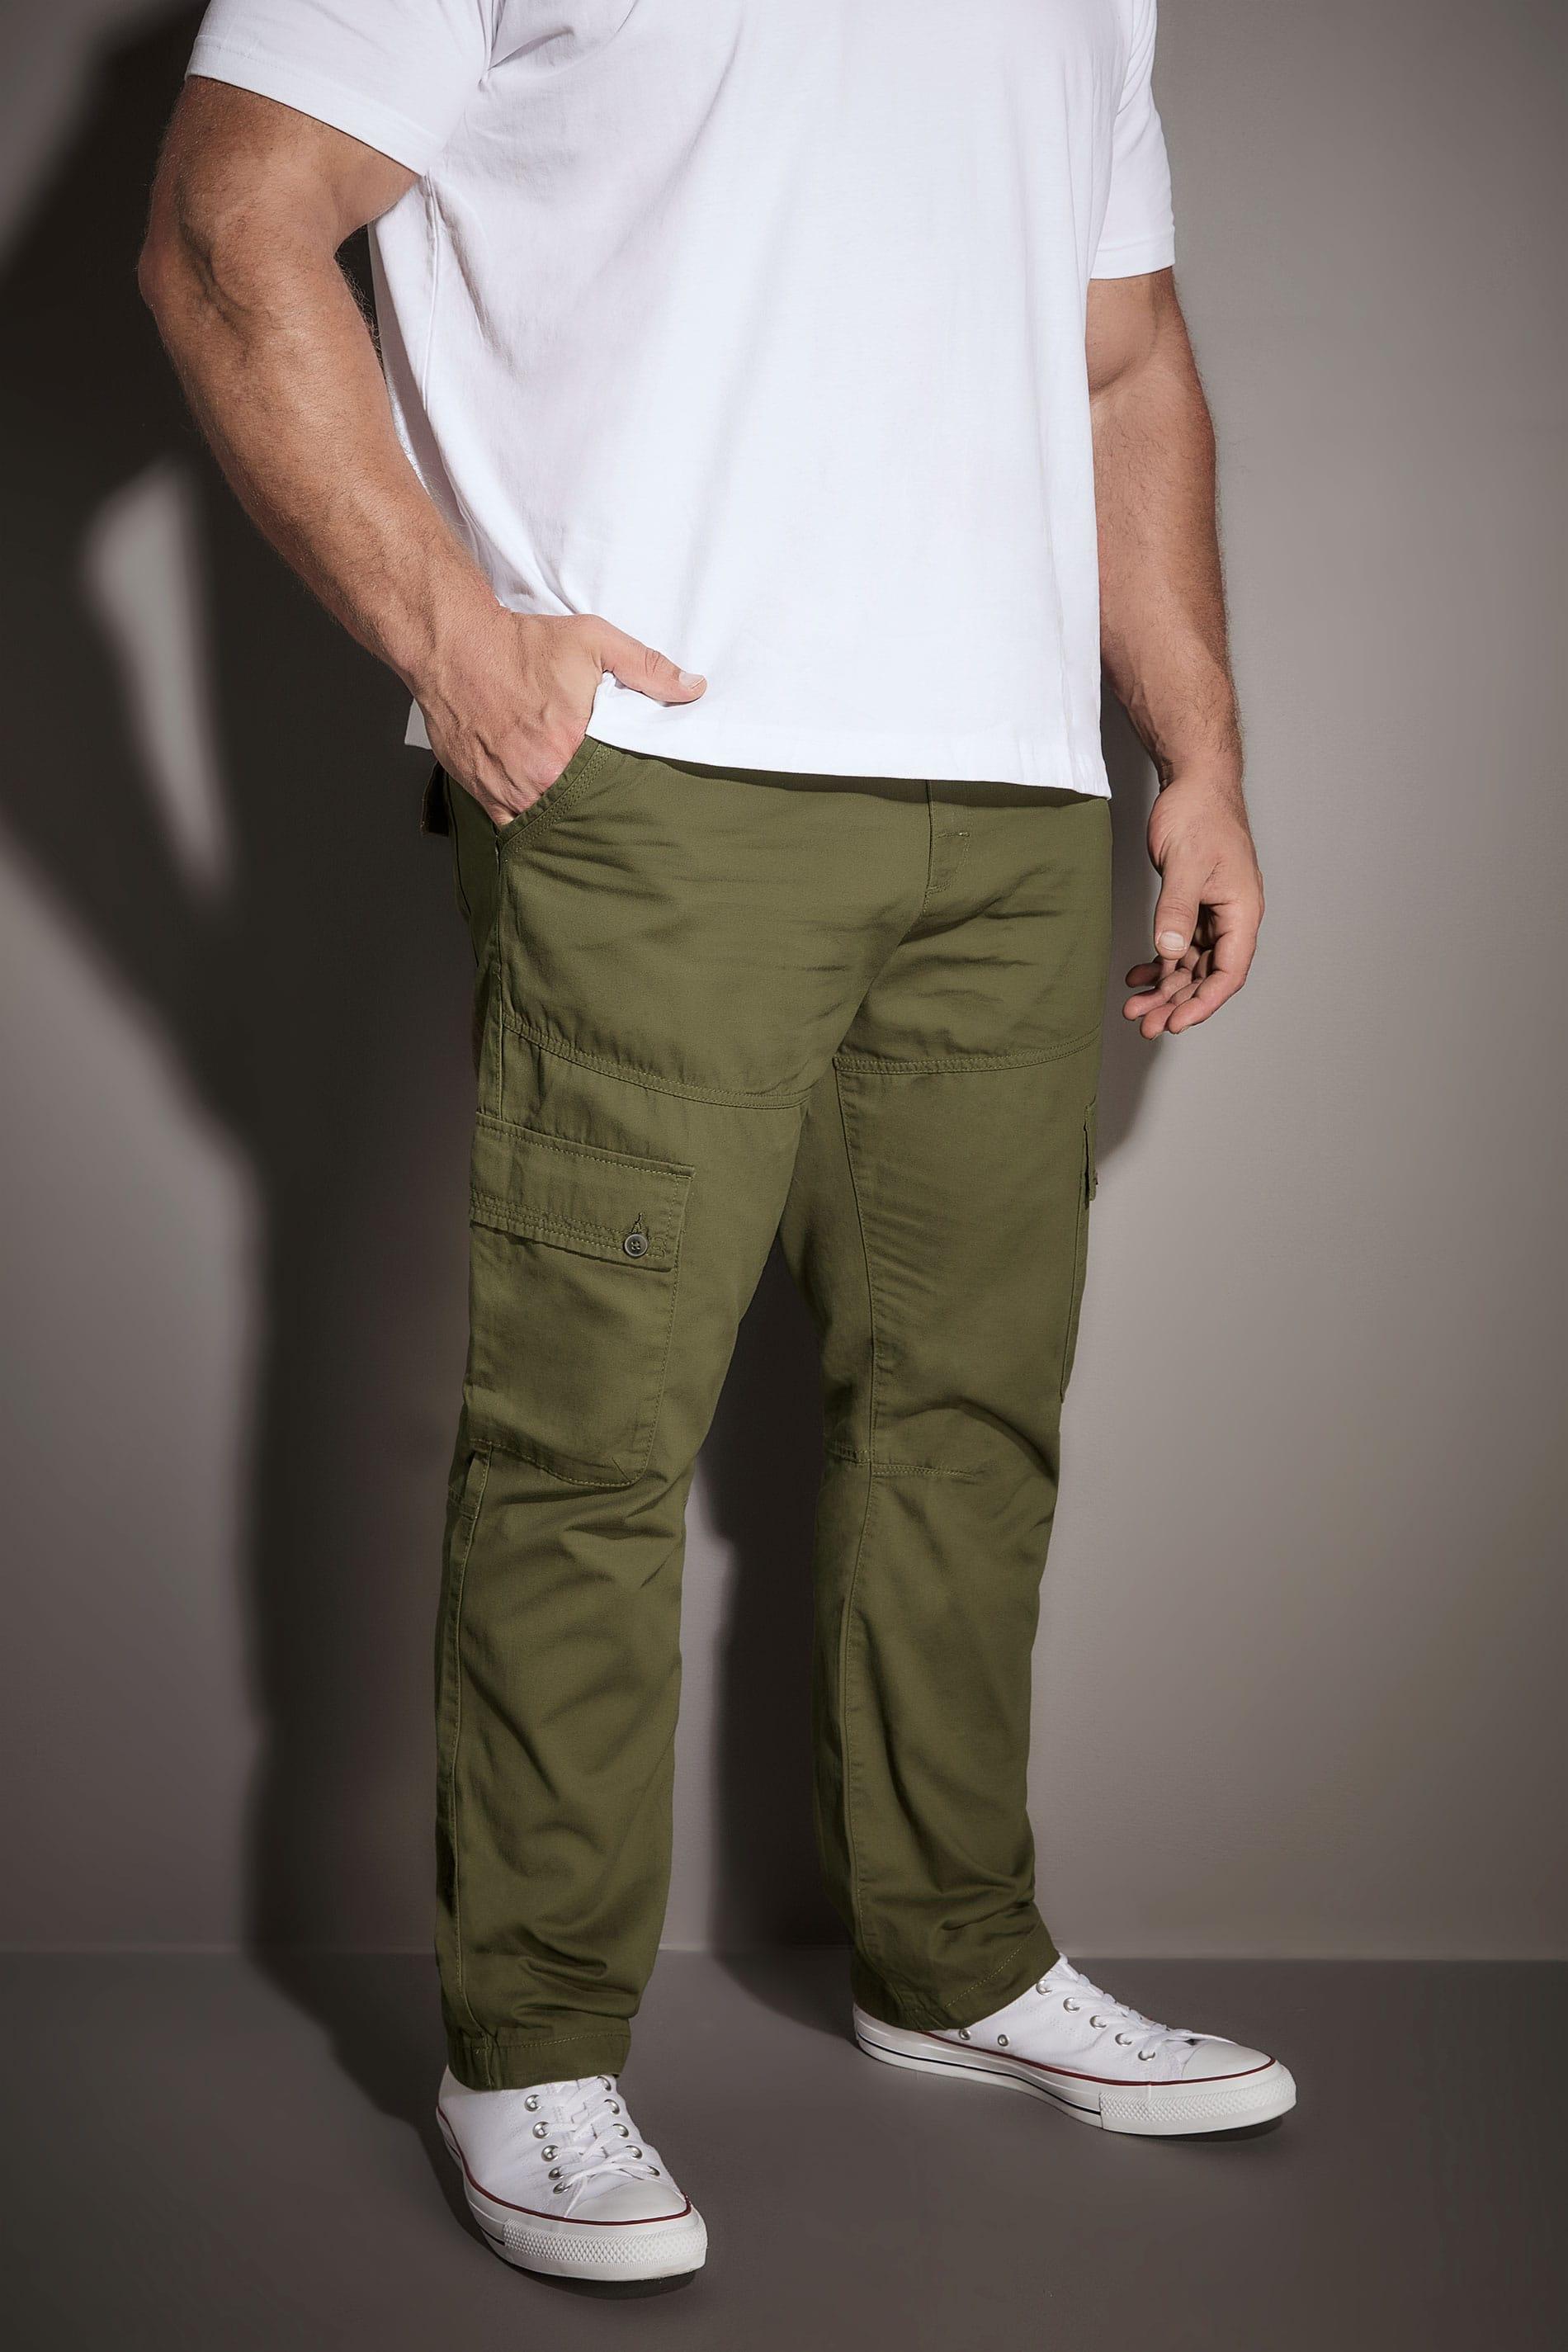 BadRhino Khaki Cargo Trouser With Utility Pockets & Canvas Belt